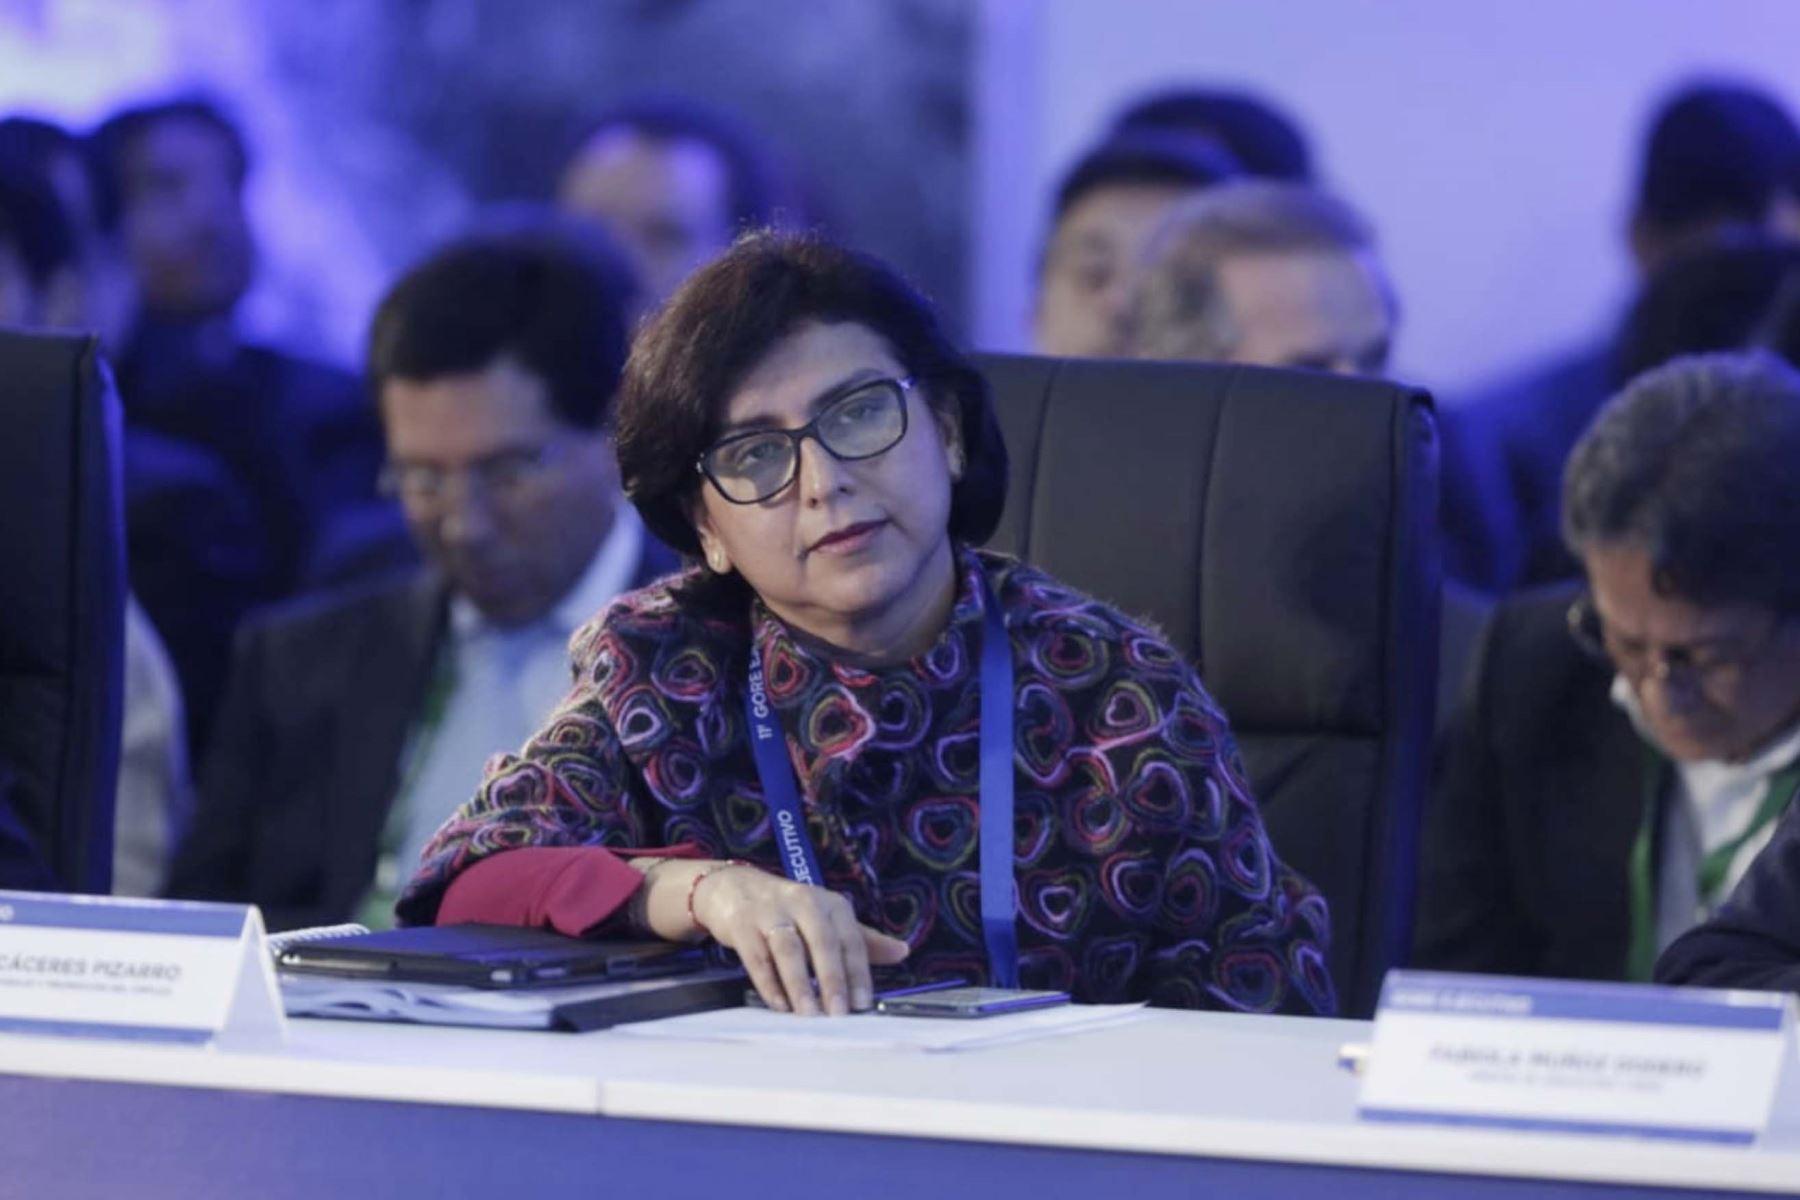 Ministra de Trabajo, Sylvia Cáceres participa  en el 11º Gore Ejecutivo en la Fortaleza Real Felipe del Callao.  Foto:ANDINA/PCM